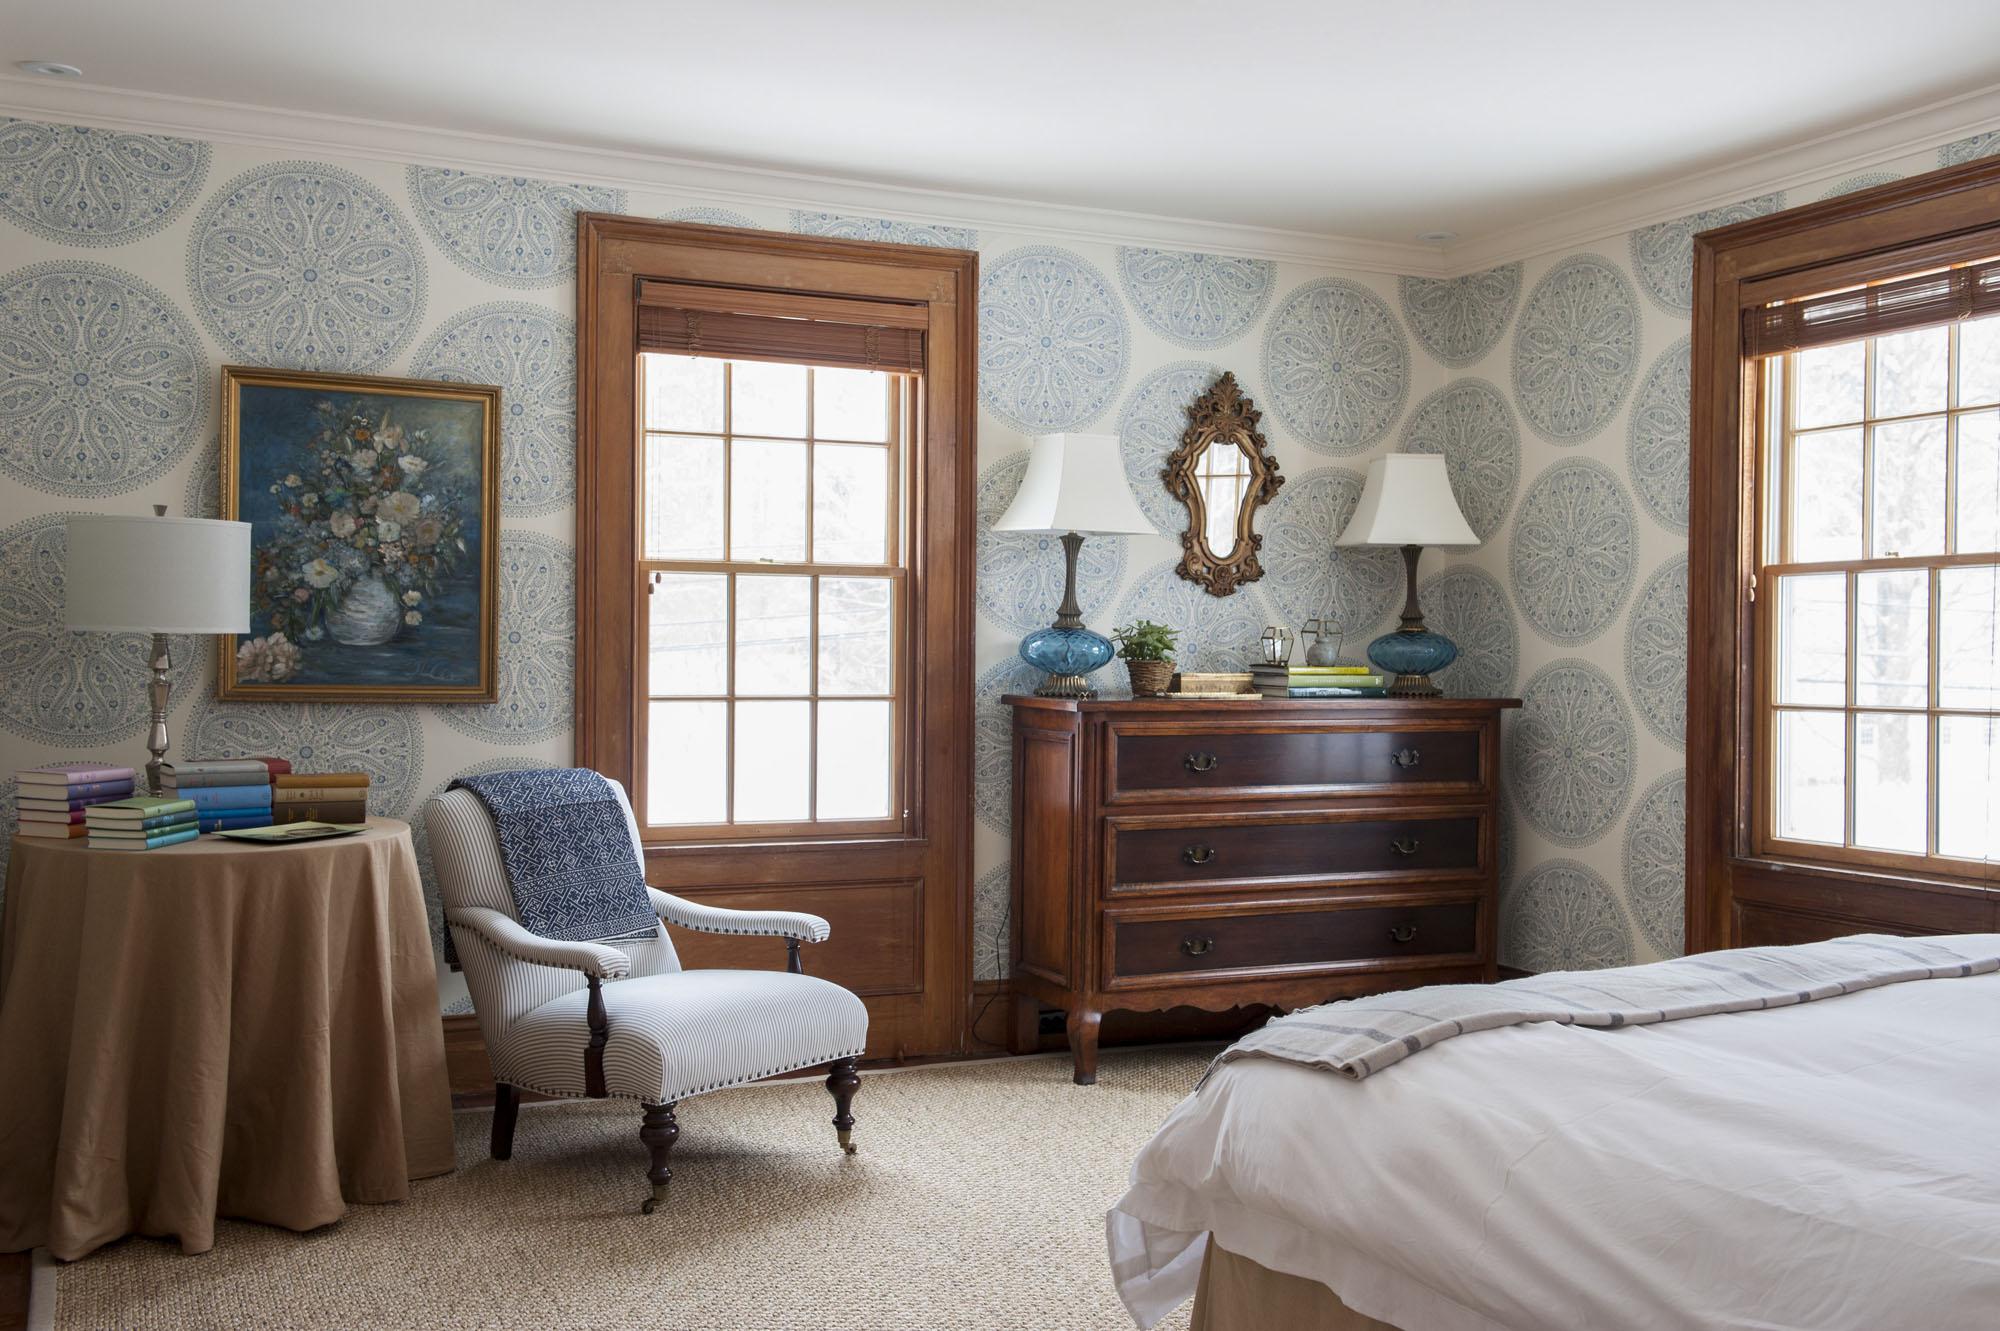 master-bedroom-design-ideas-with-wallpaper-rafe-churchill